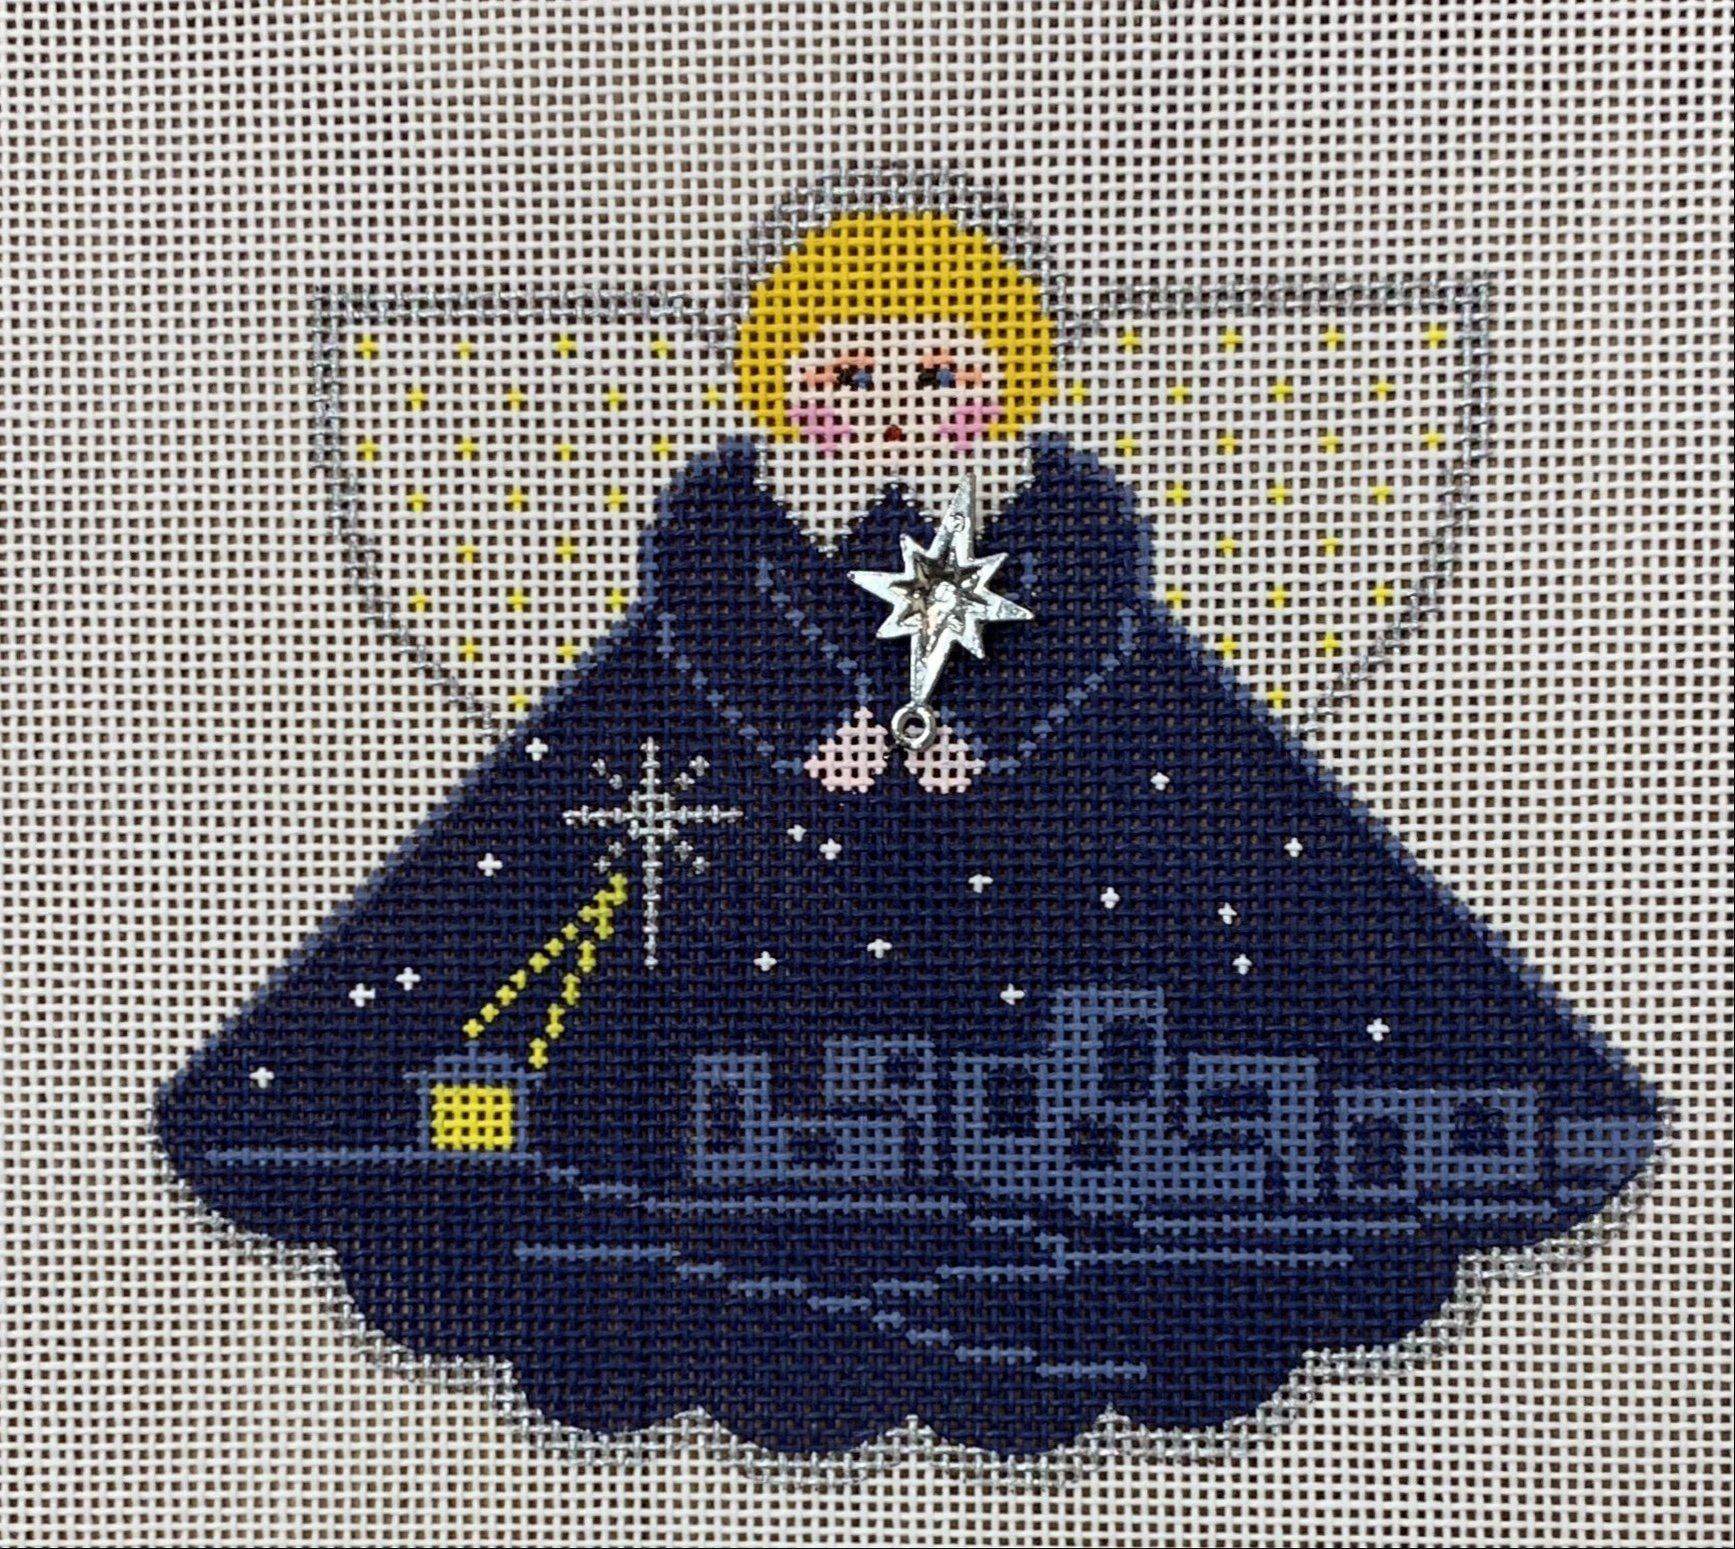 Angel Star of Bethlehem